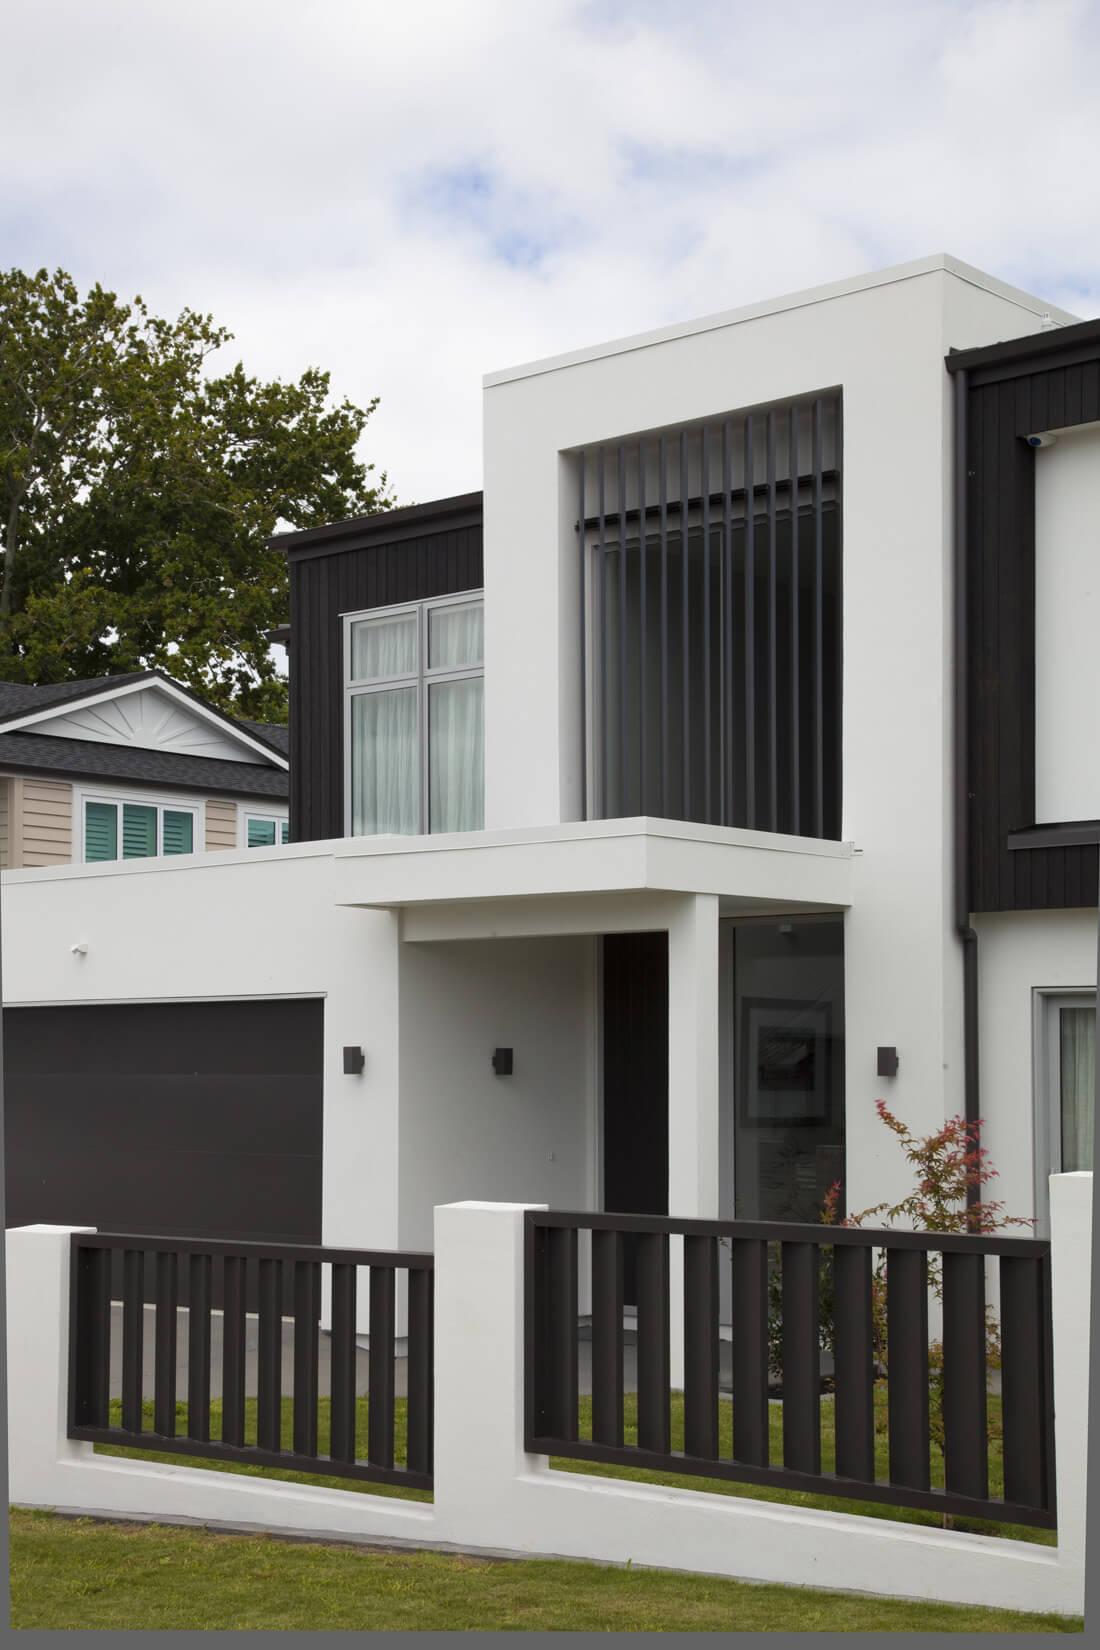 Swindon Close project - gallery image 4